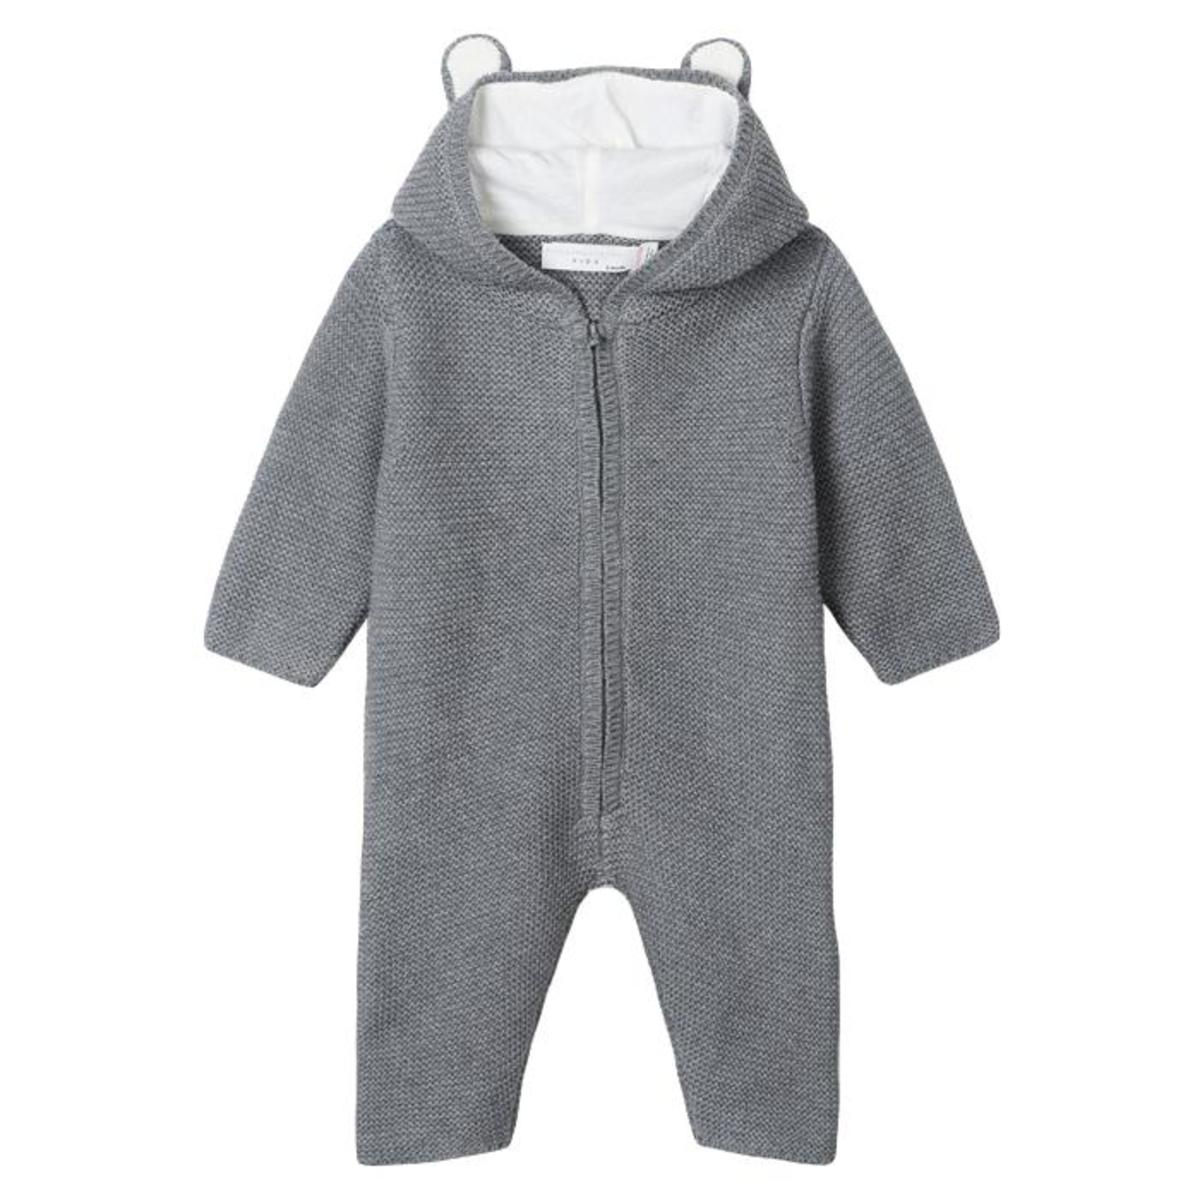 f4af225cb2d1 KIDS Stella McCartney Baby Acorn Bunny Knit Jumpsuit With Hood ...